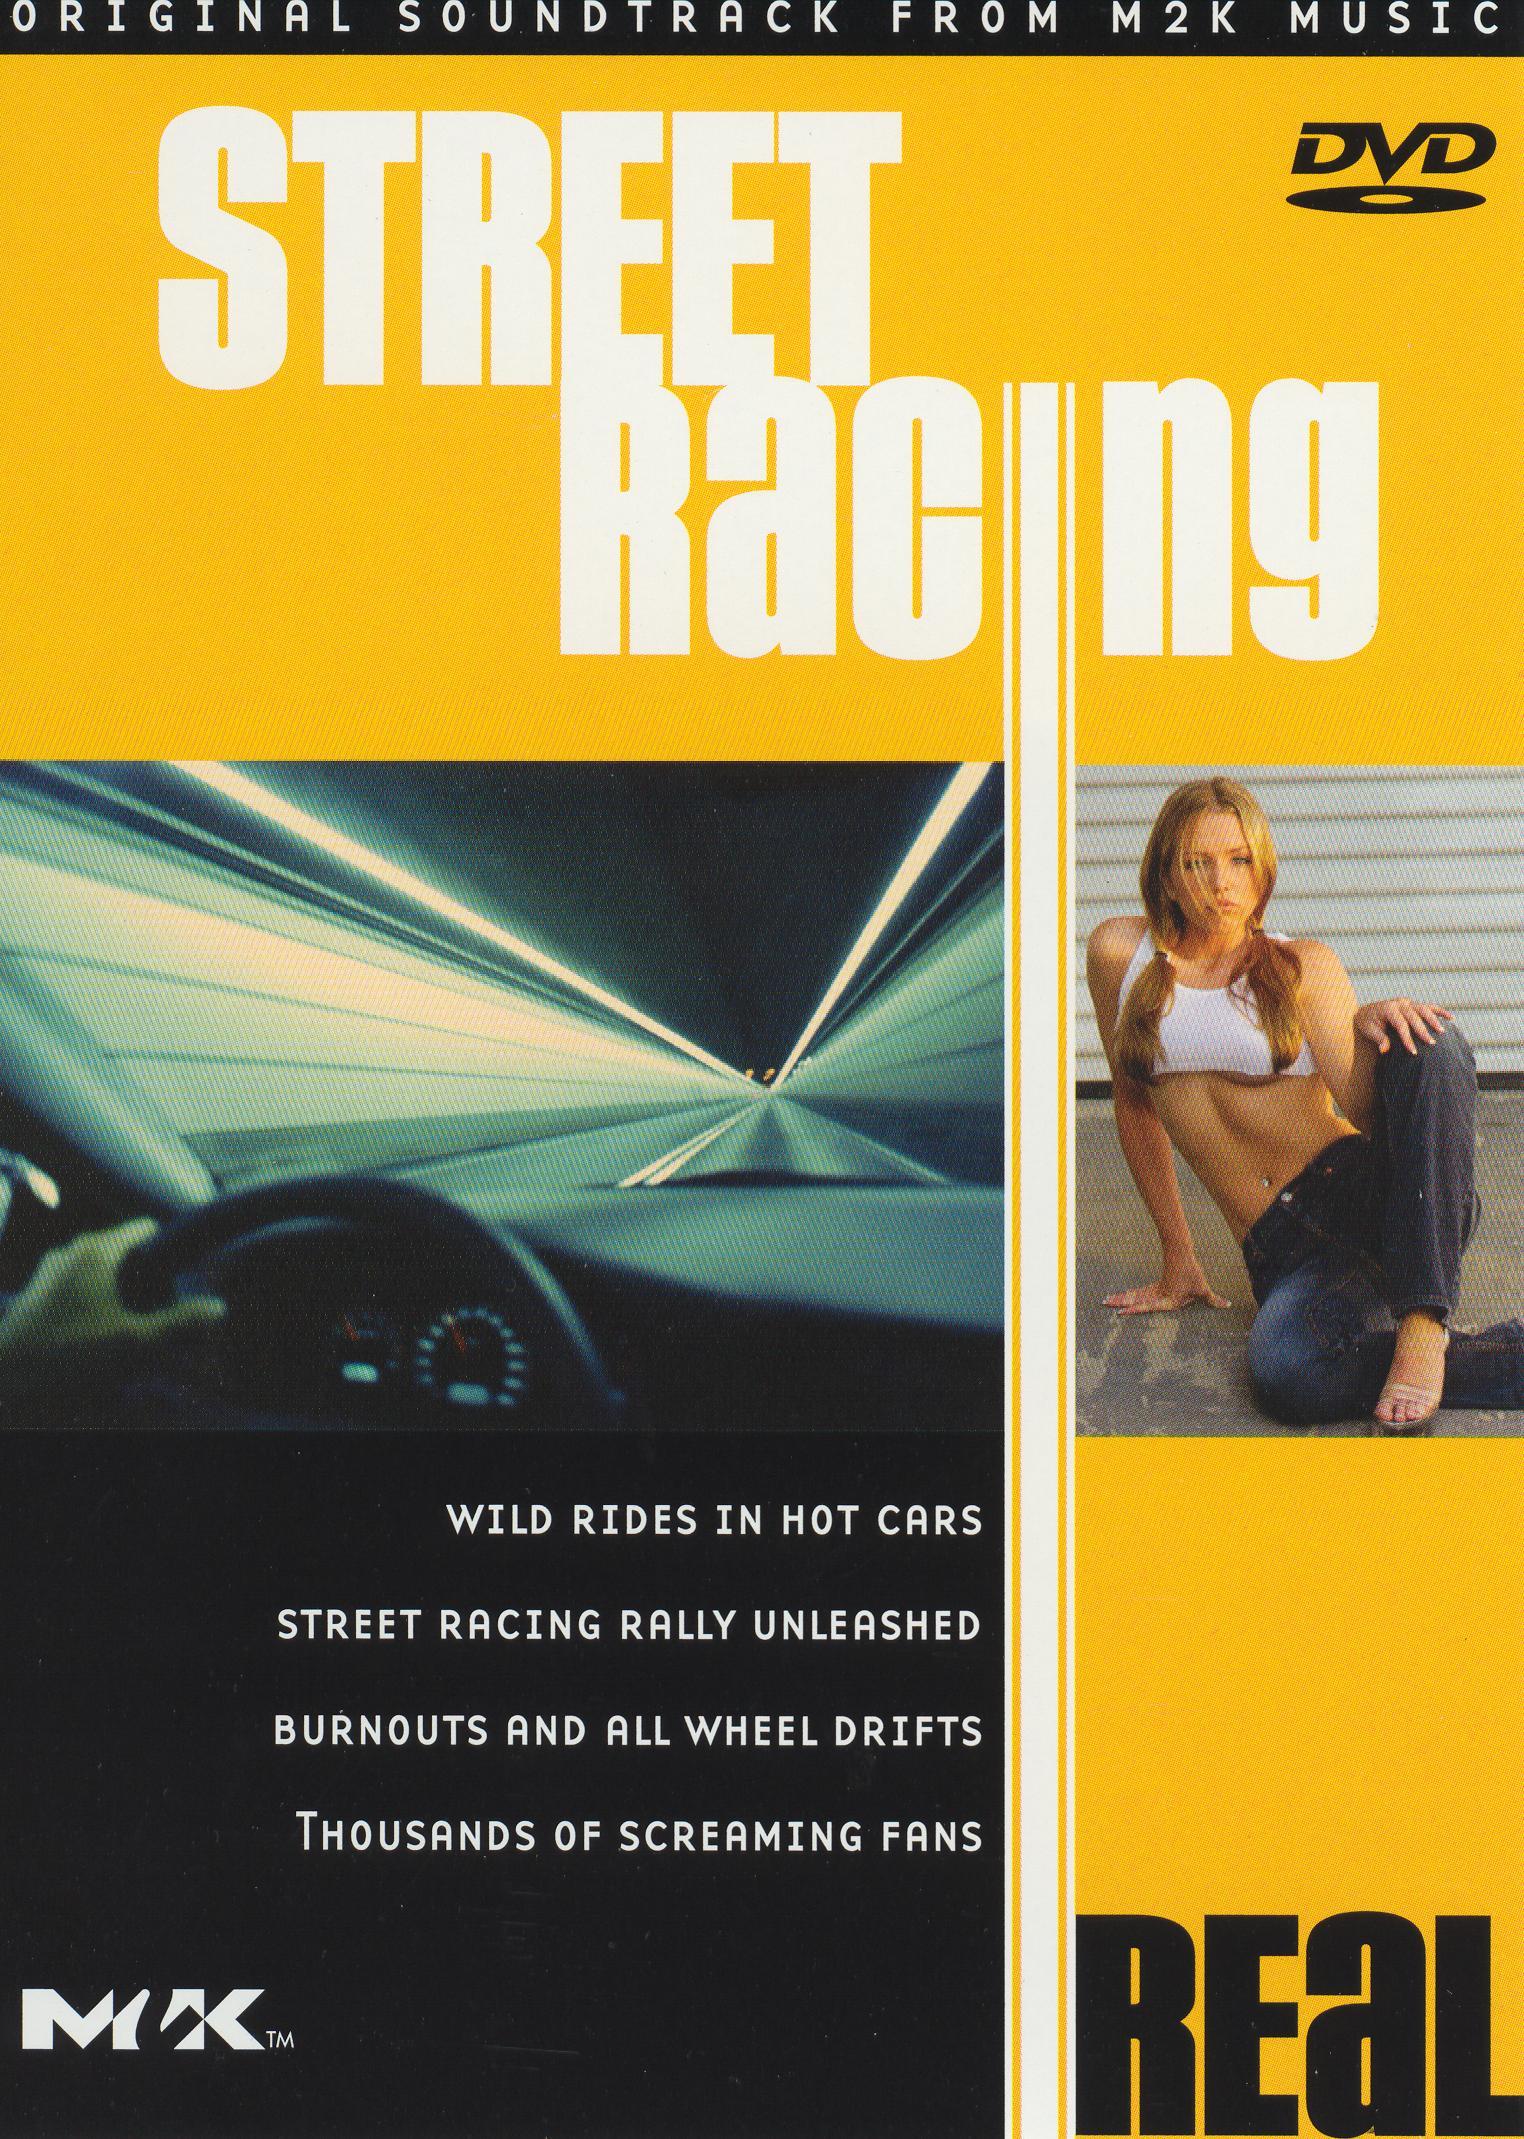 Street Racing, Vol. 2: Real